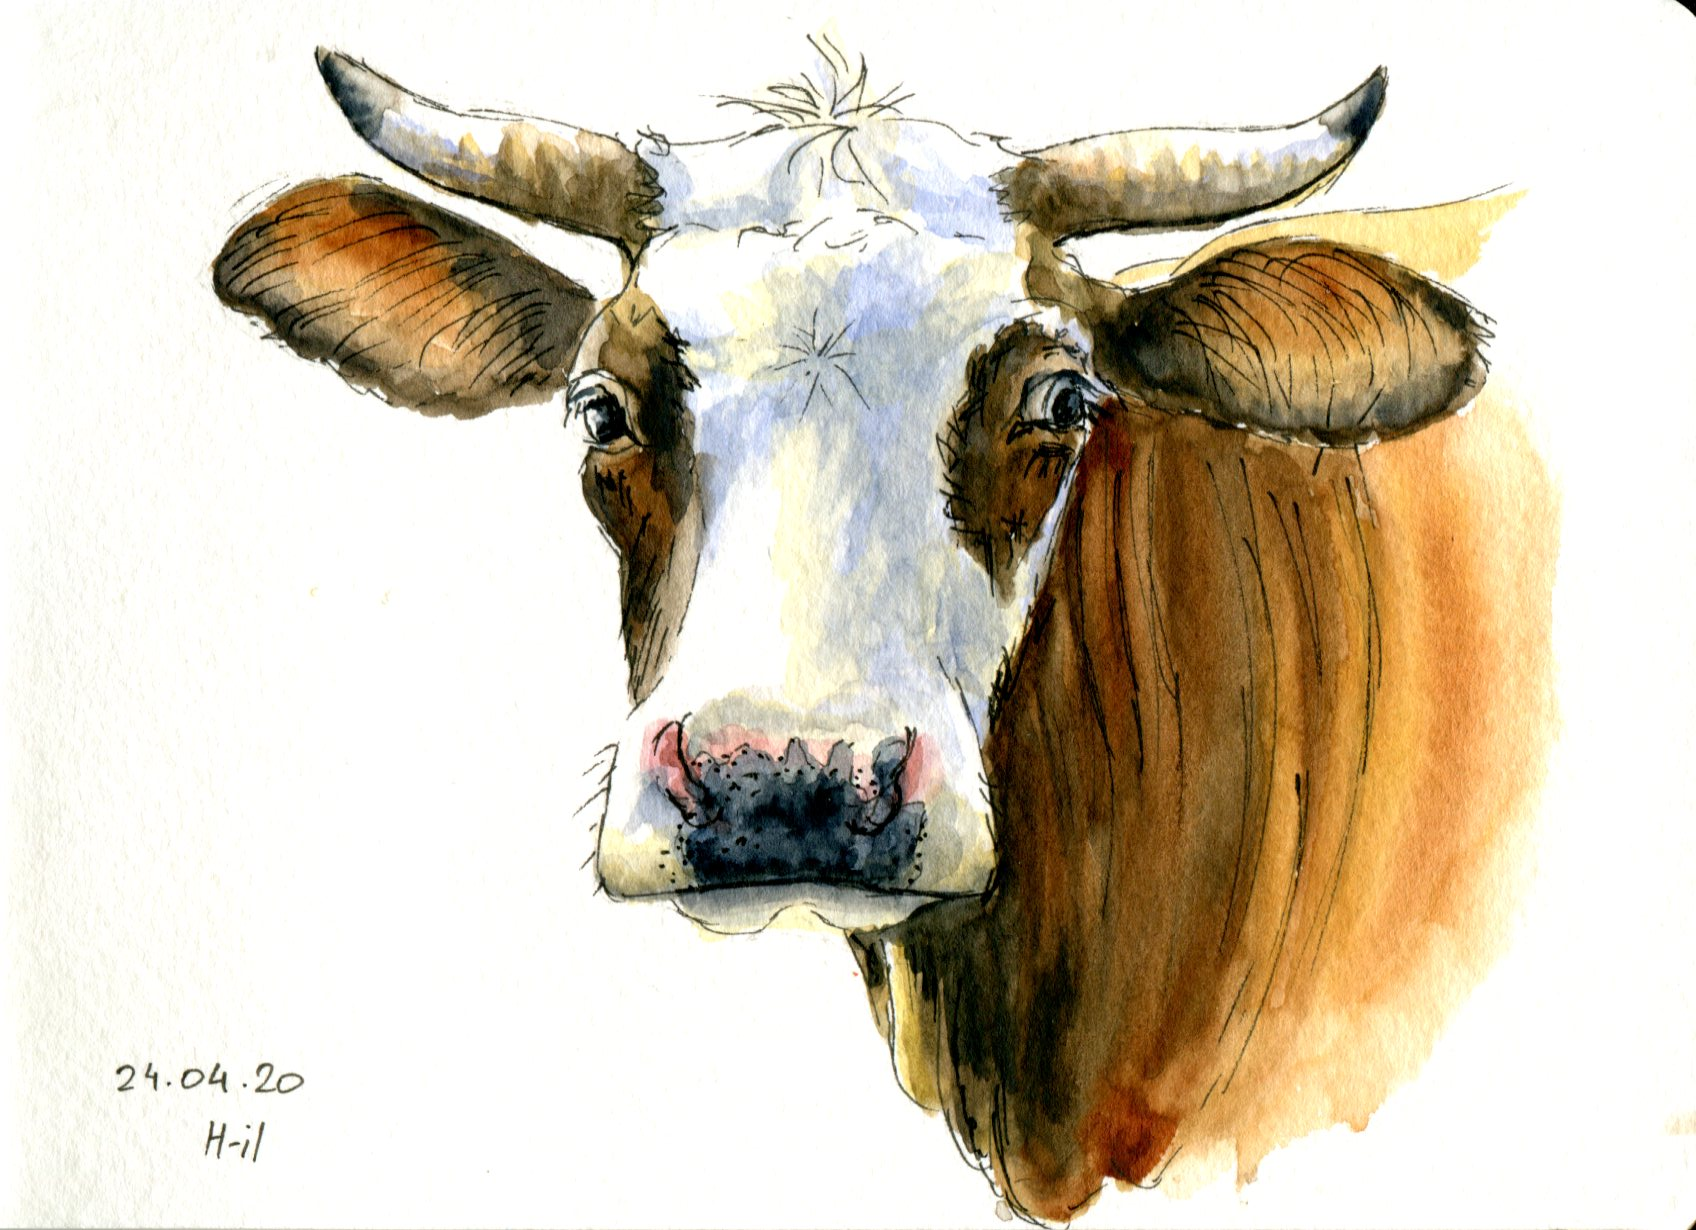 Vache blanche et brune041